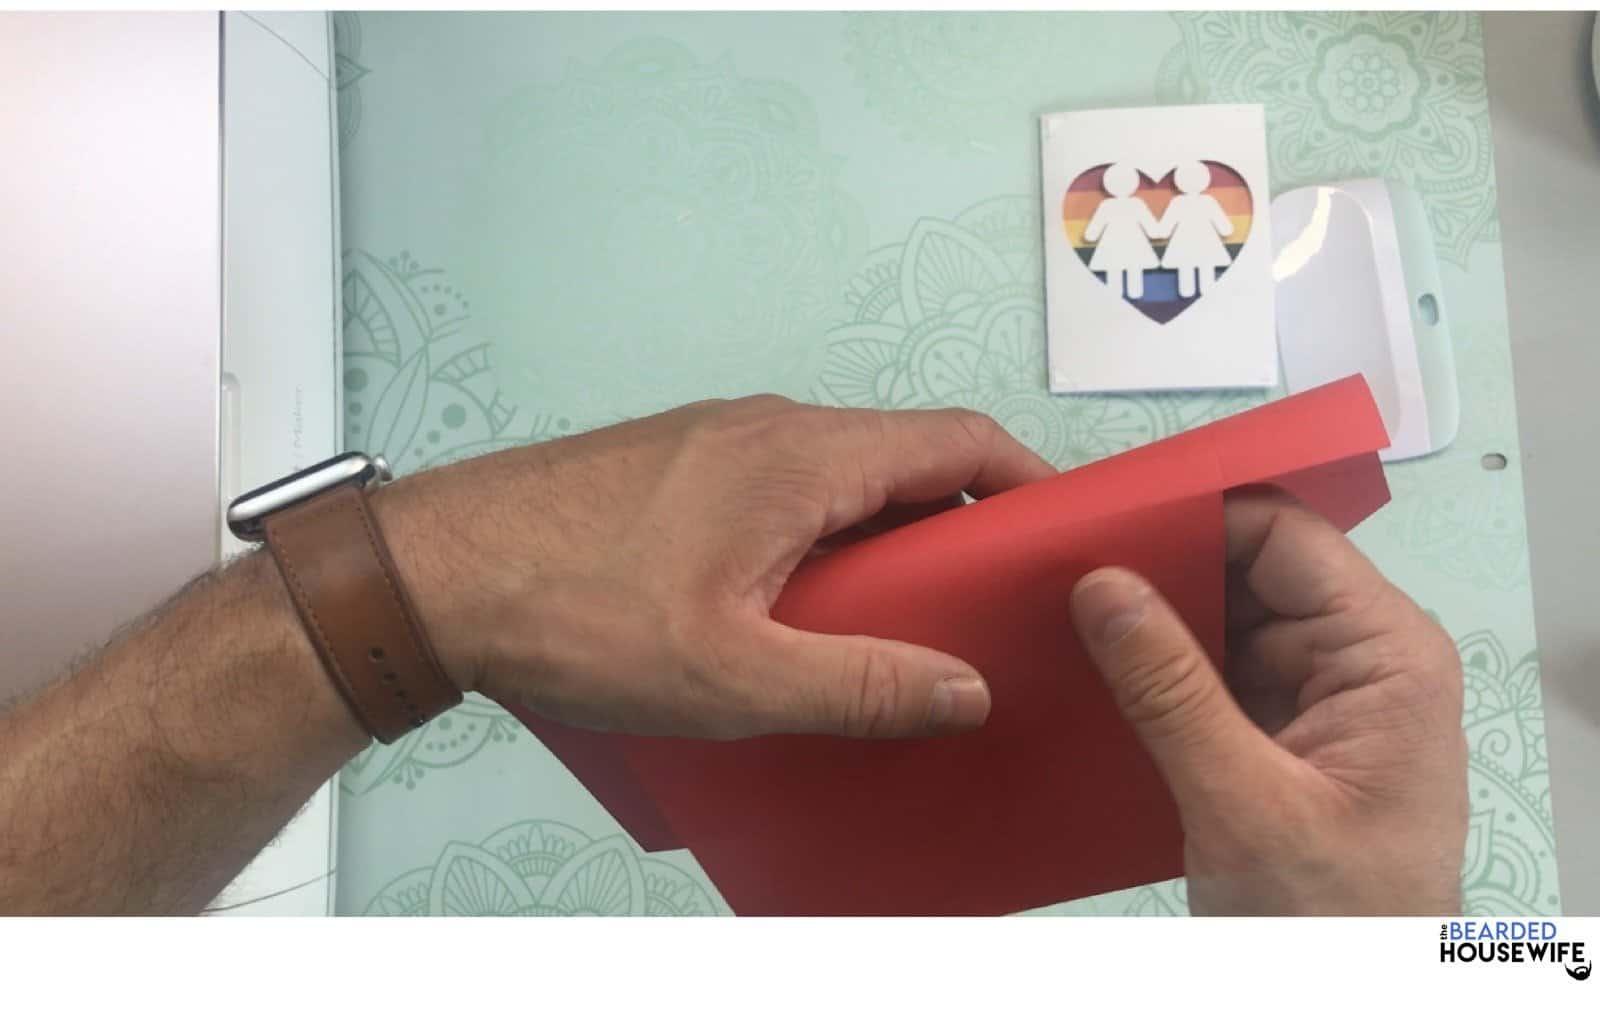 fold the envelope along the score line